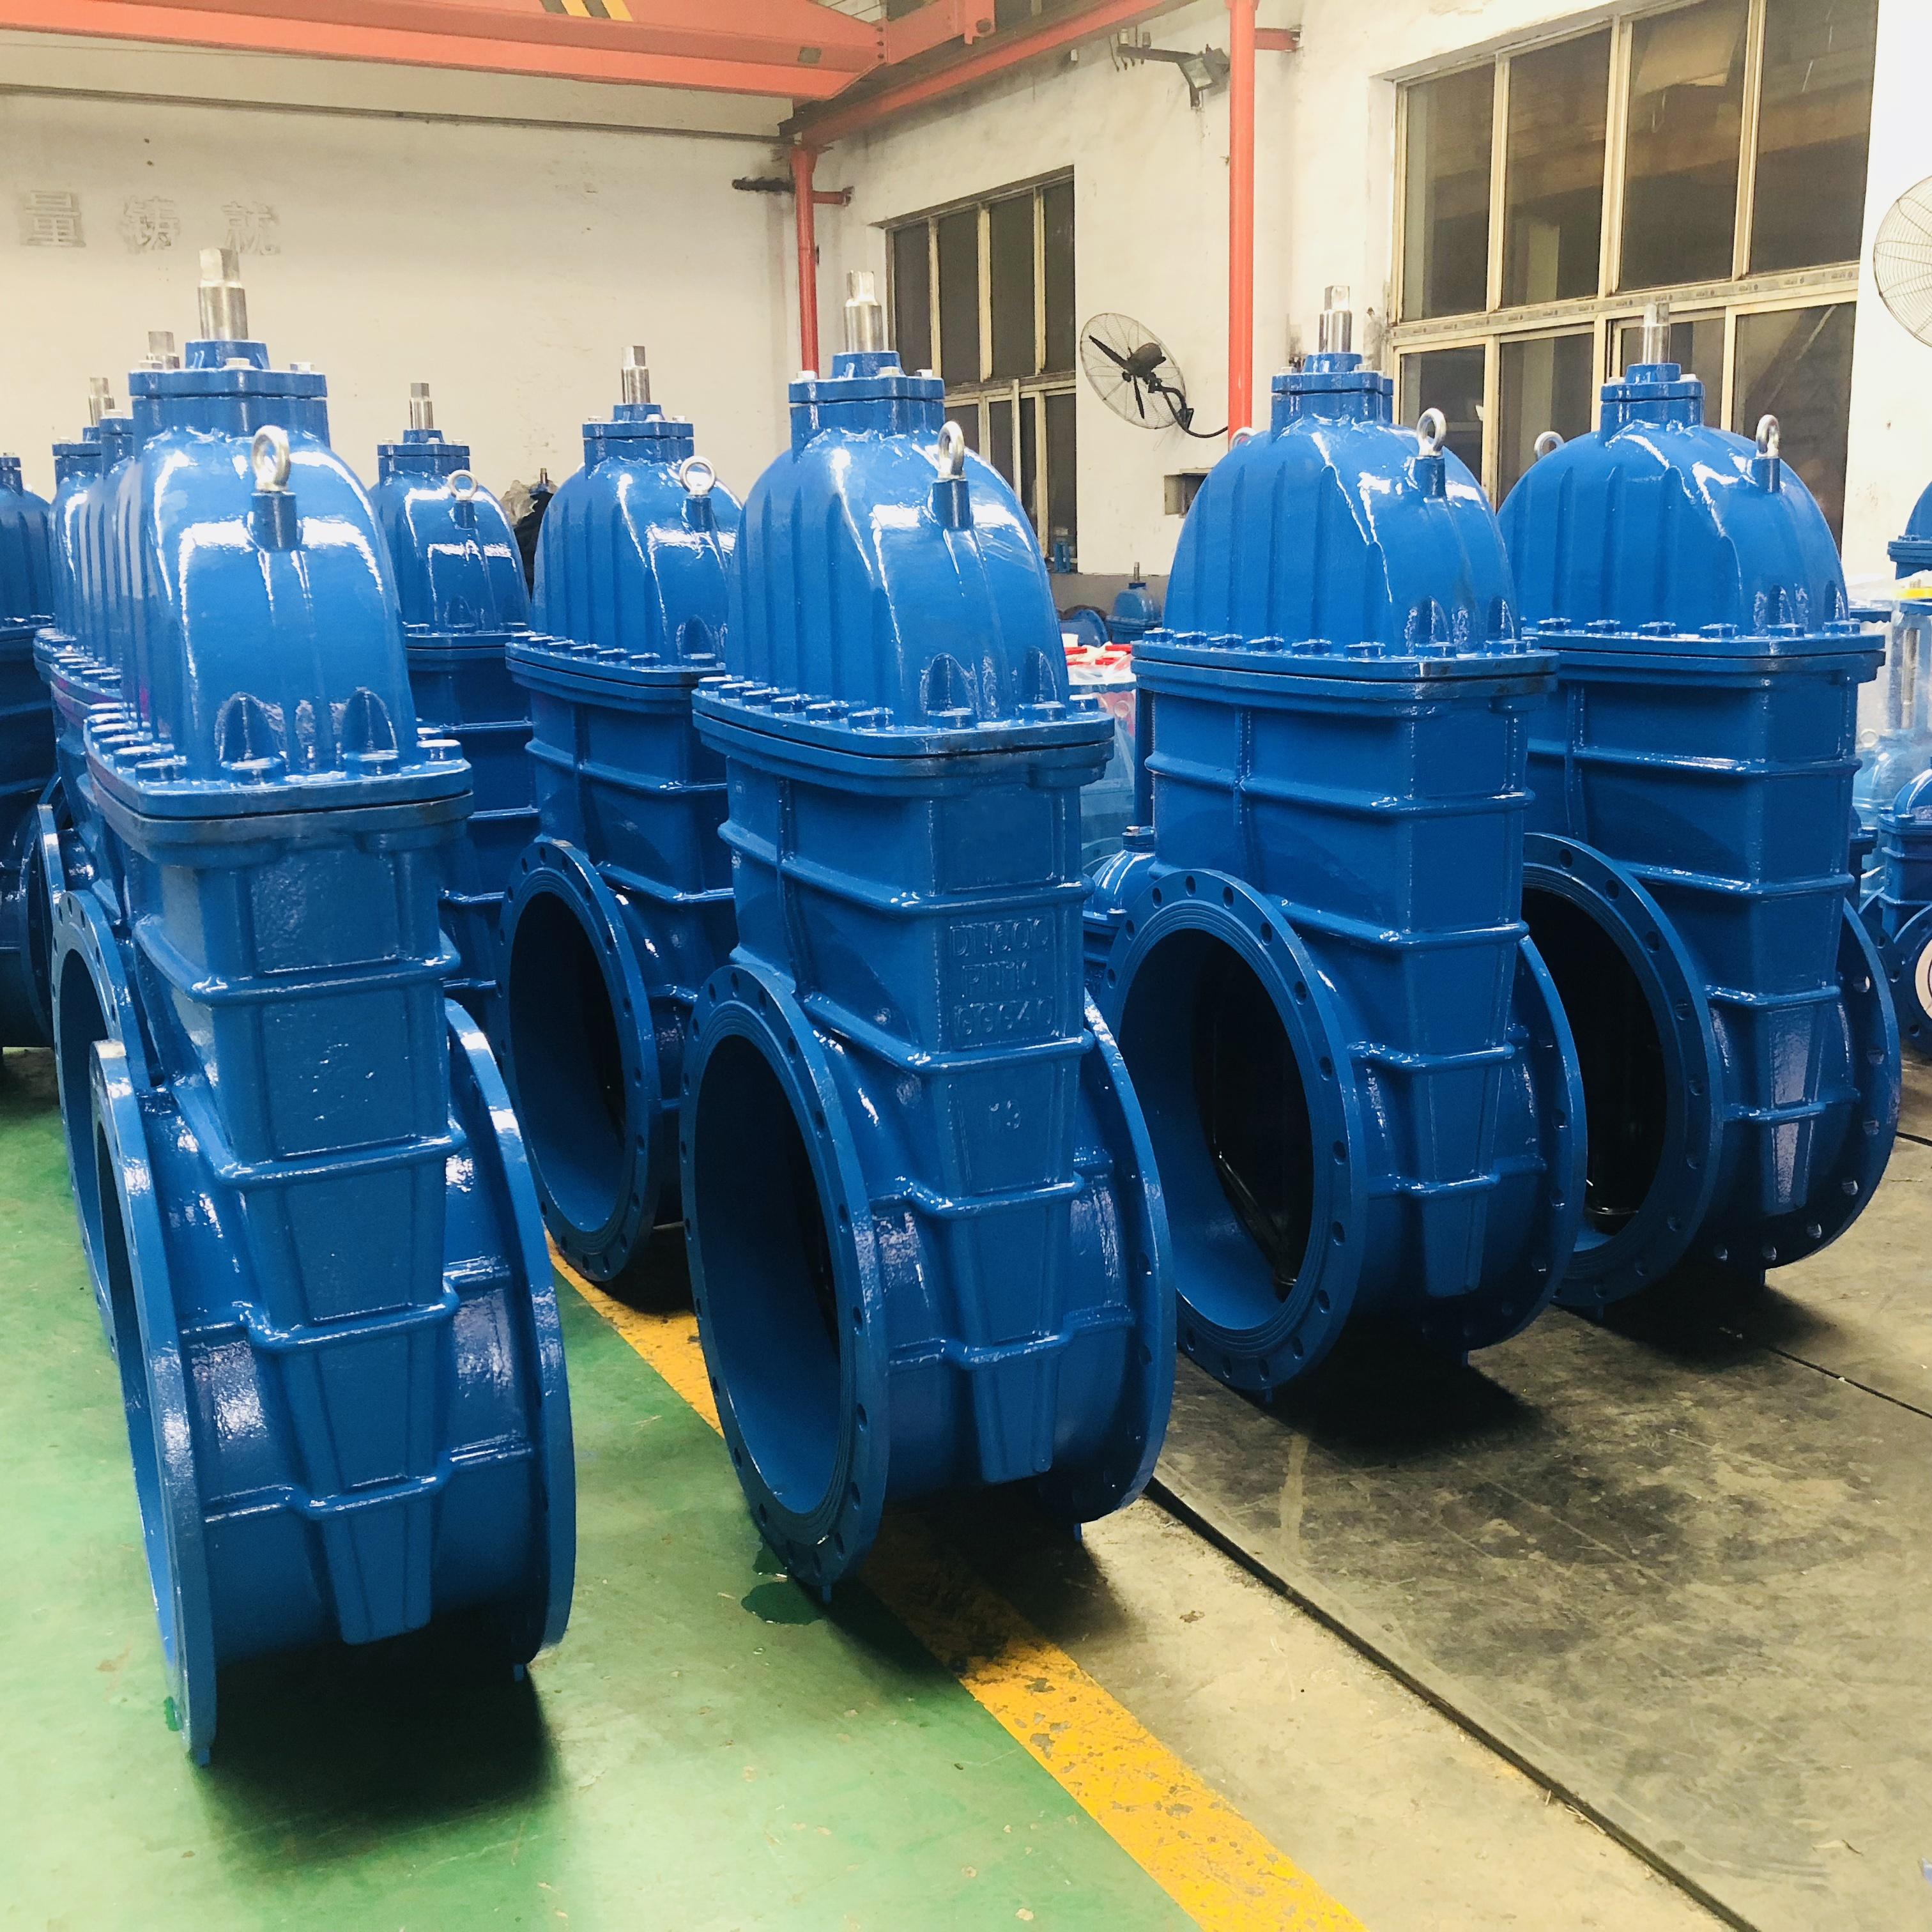 BS standard 24 inch DN600 ductile iron non-rising stem flange cast iron sluice gate valve